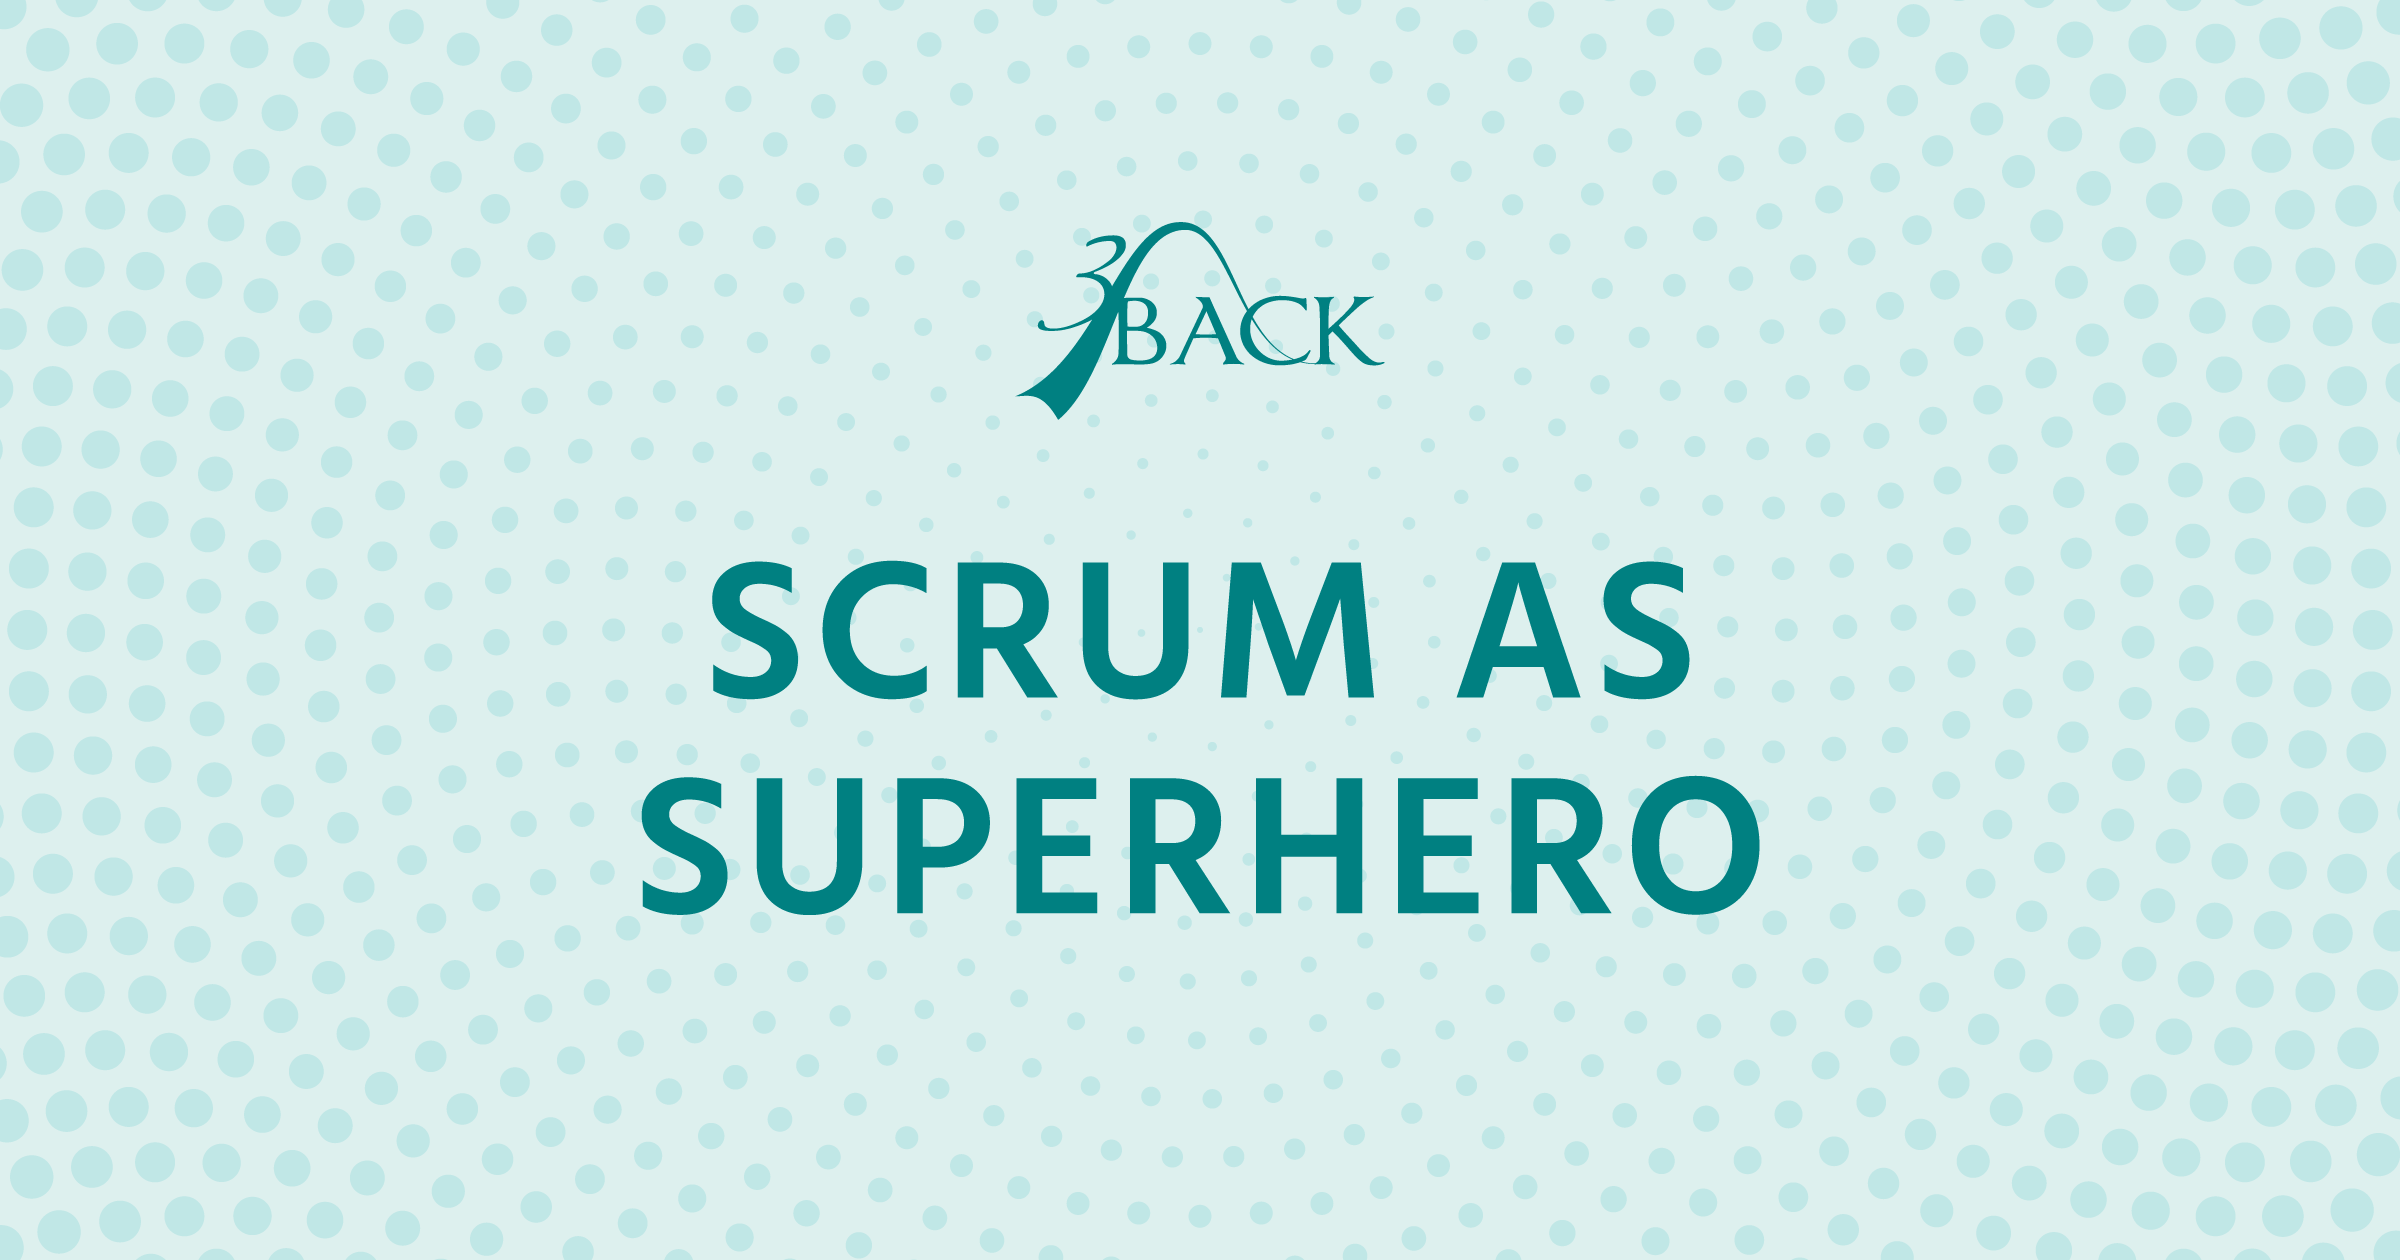 3Back-Scrum-As-Superhero